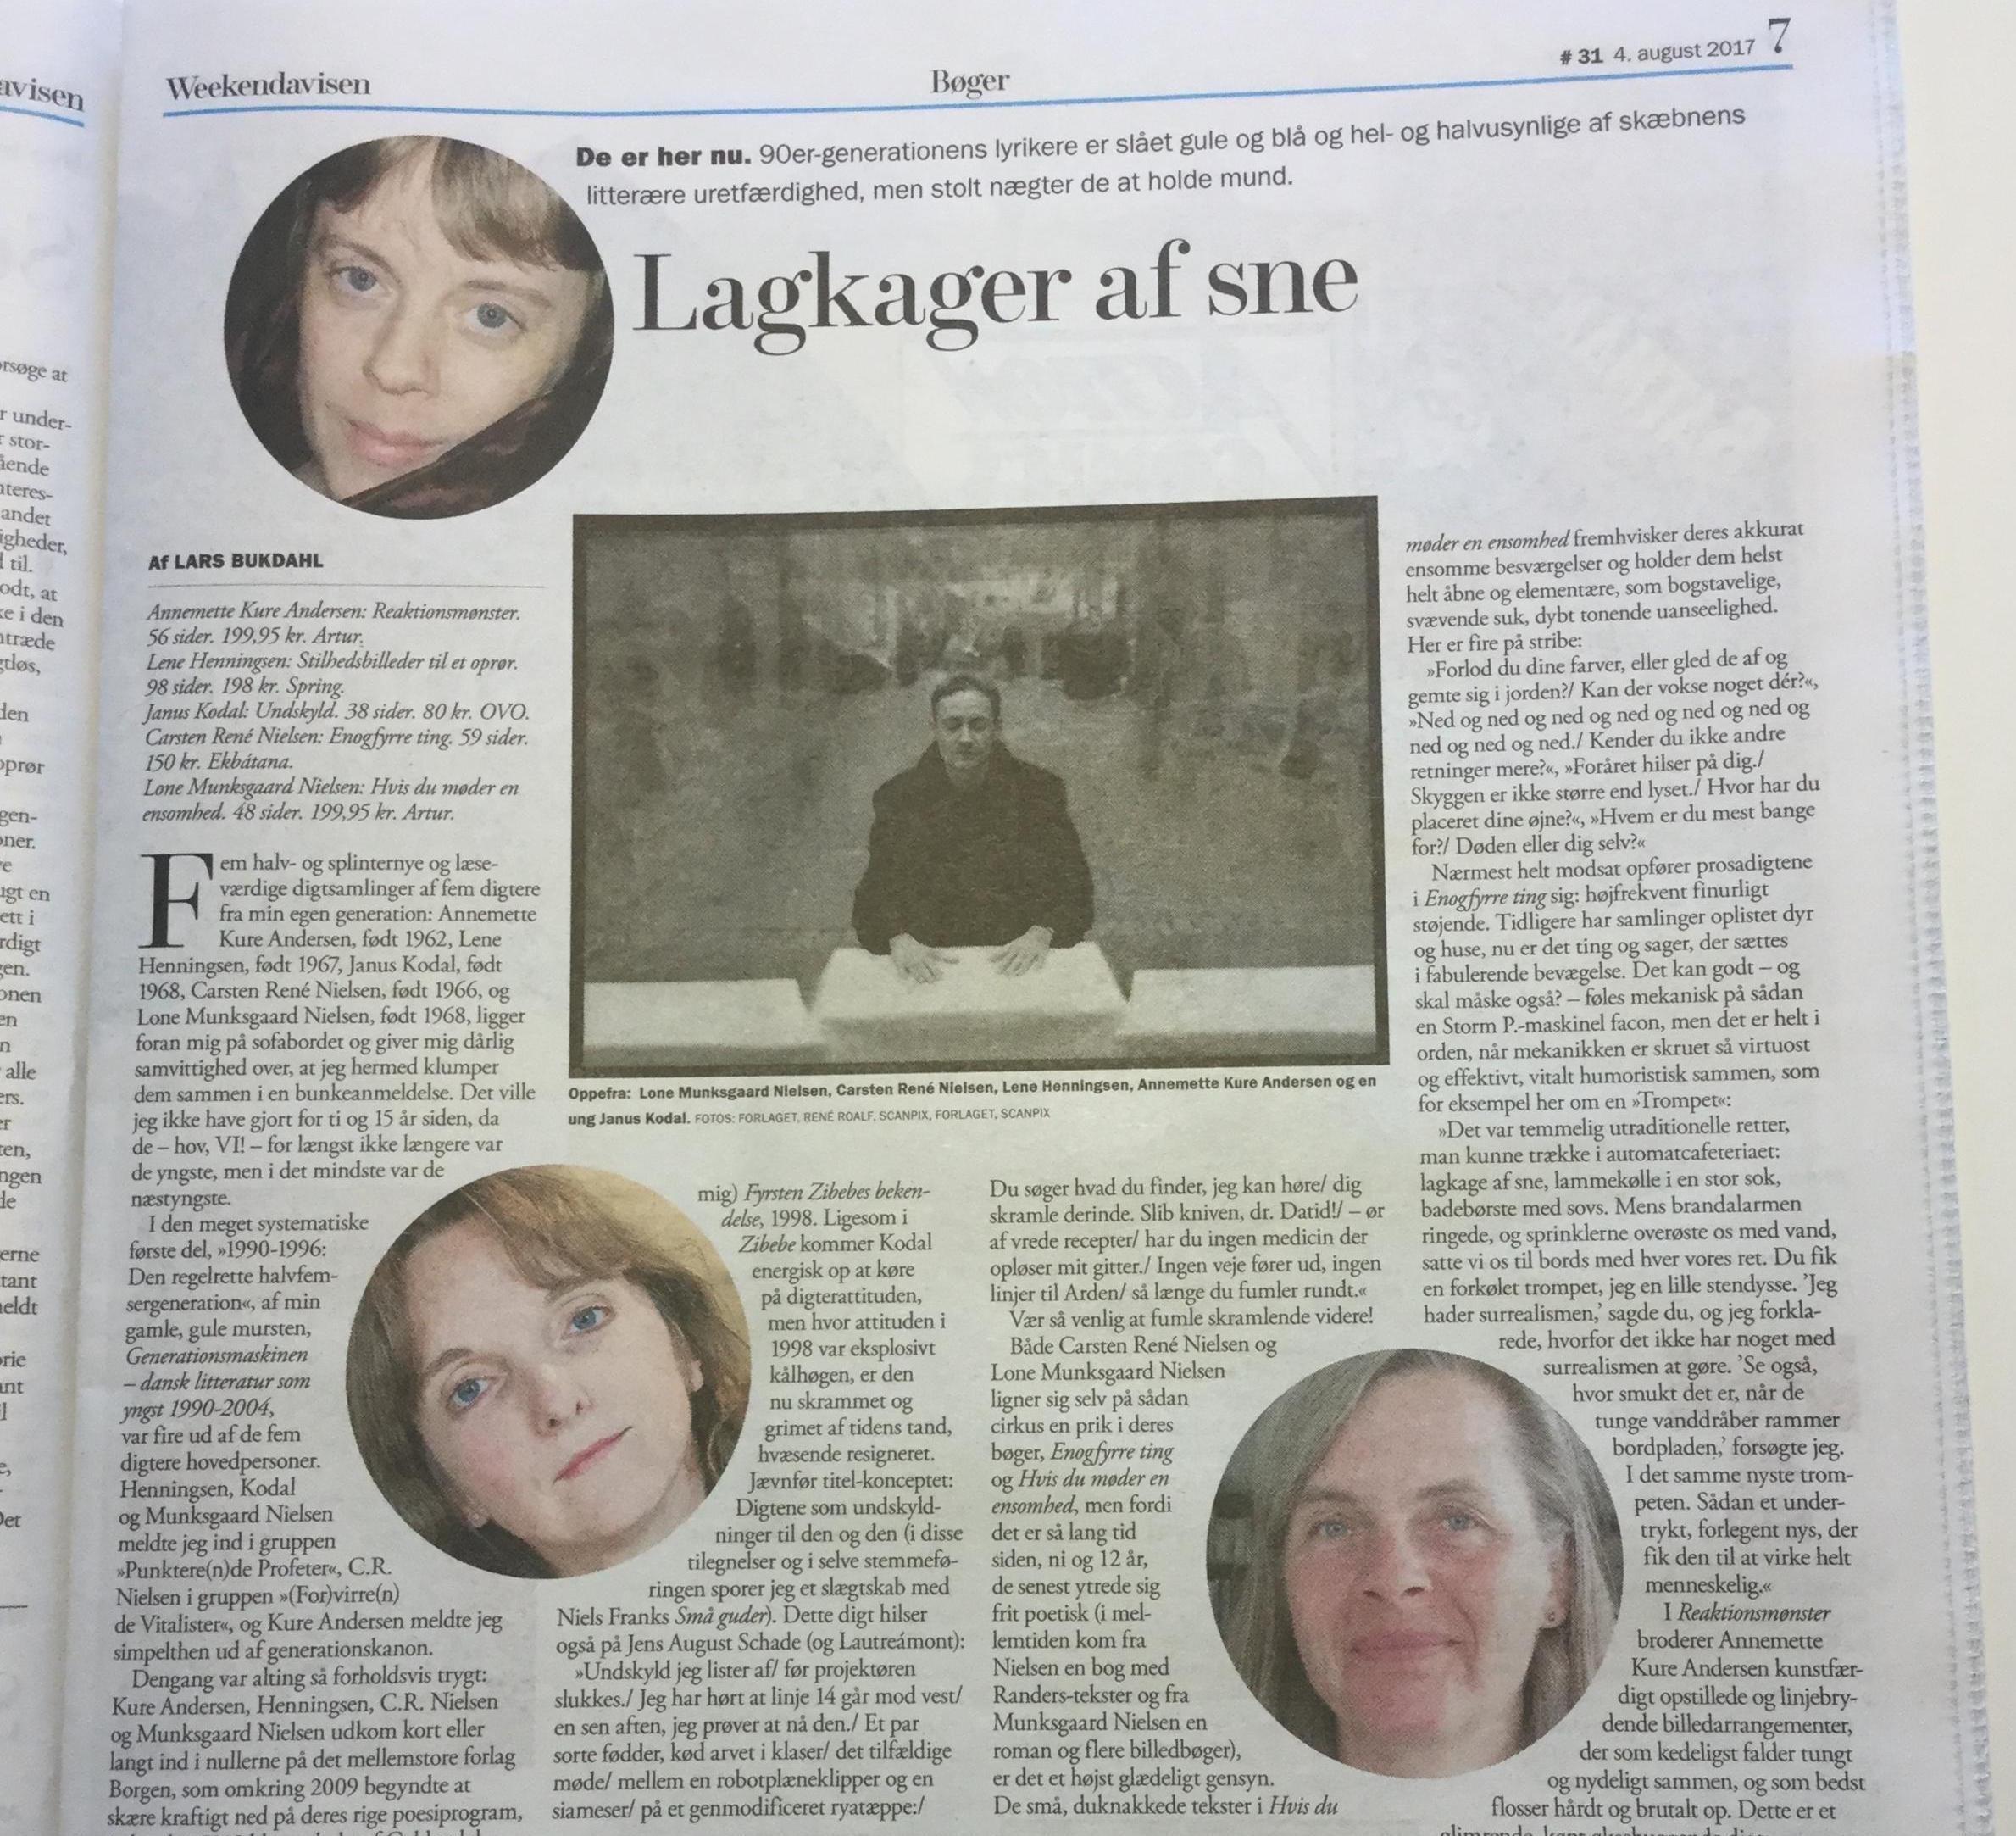 Weekendavisen, lars Bukdahl, Carsten Rene Nielsen, Enogfyrreting, anmeldelser